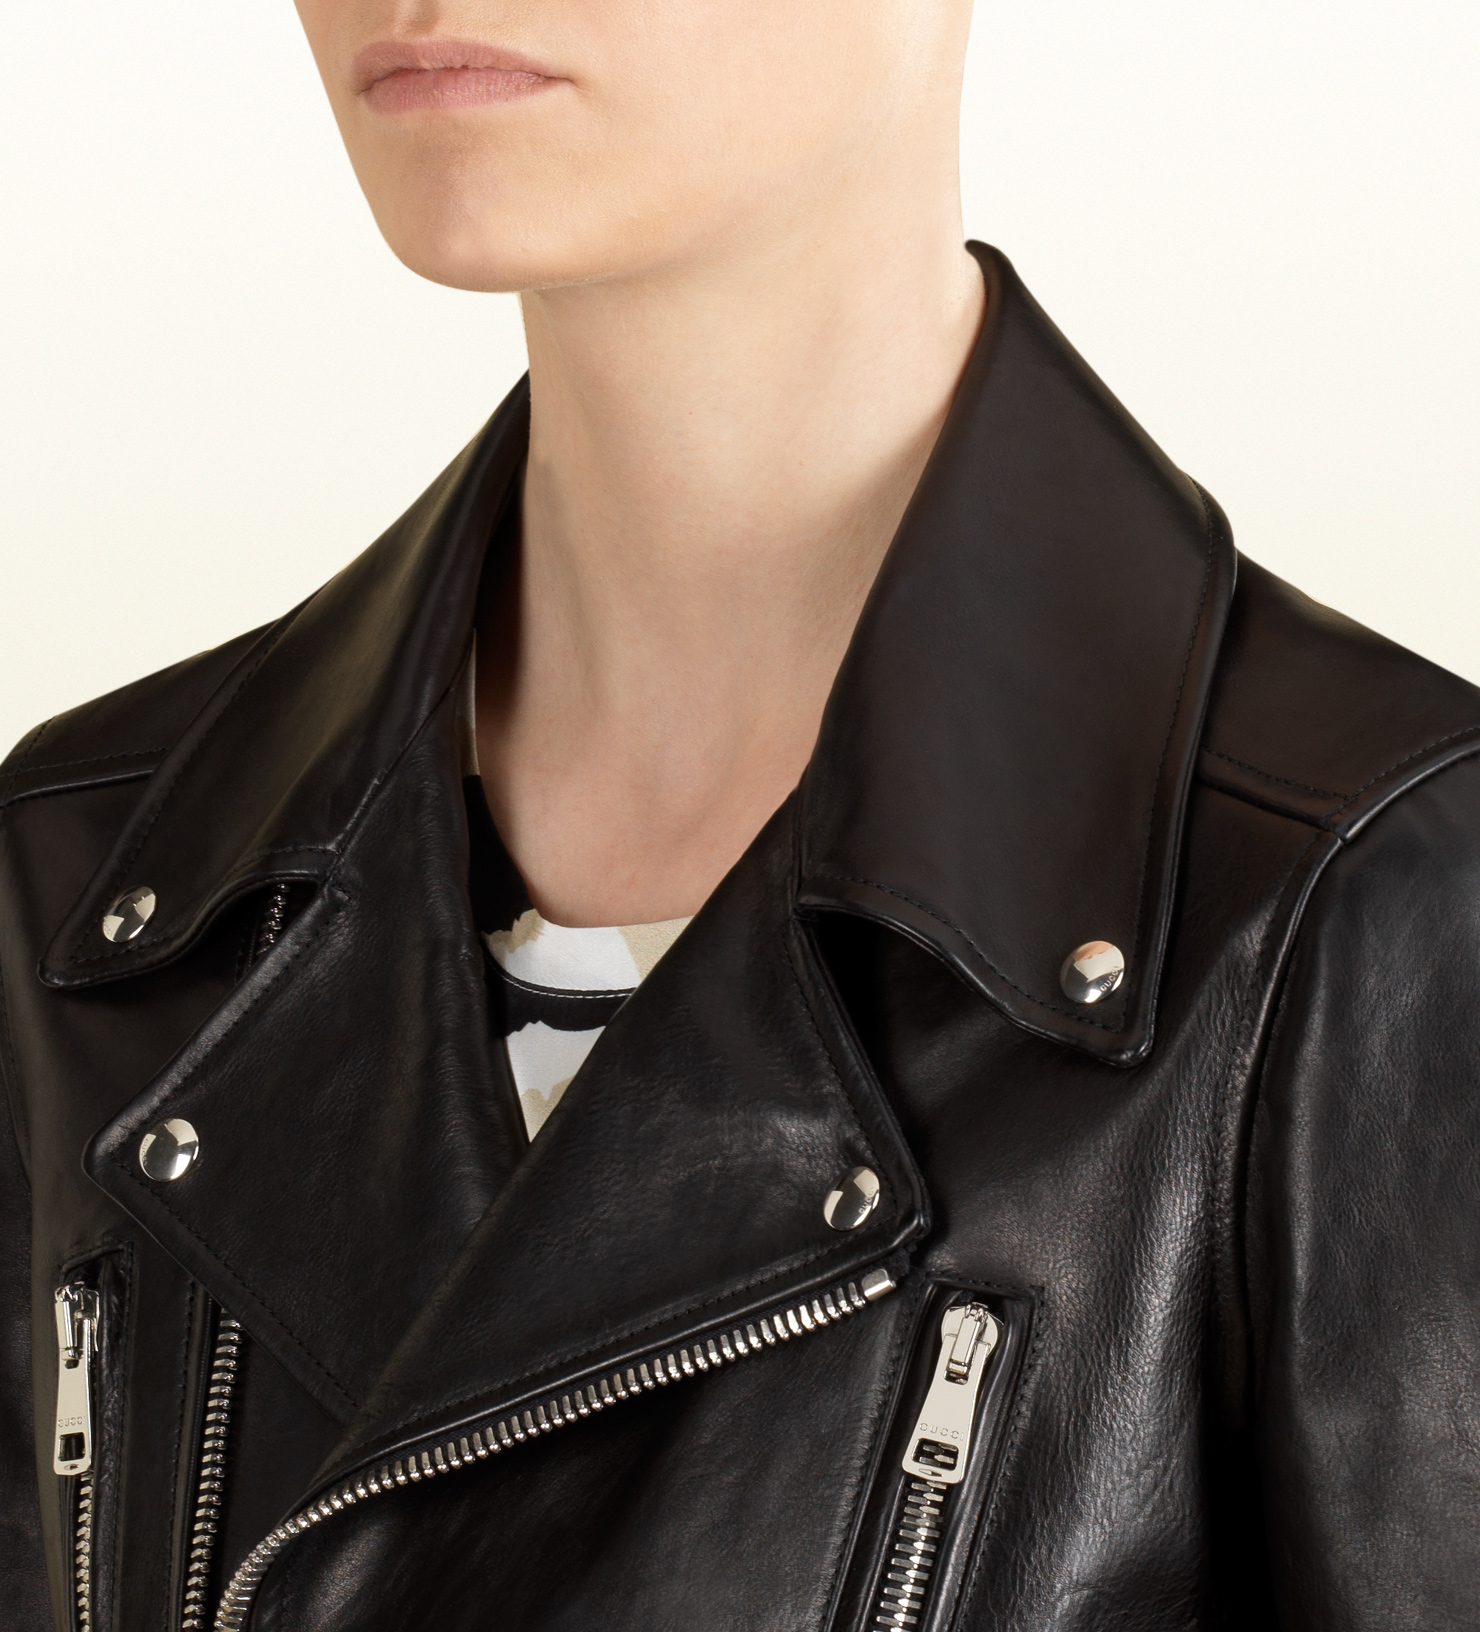 9531d5969 Gucci Black Leather Biker Jacket